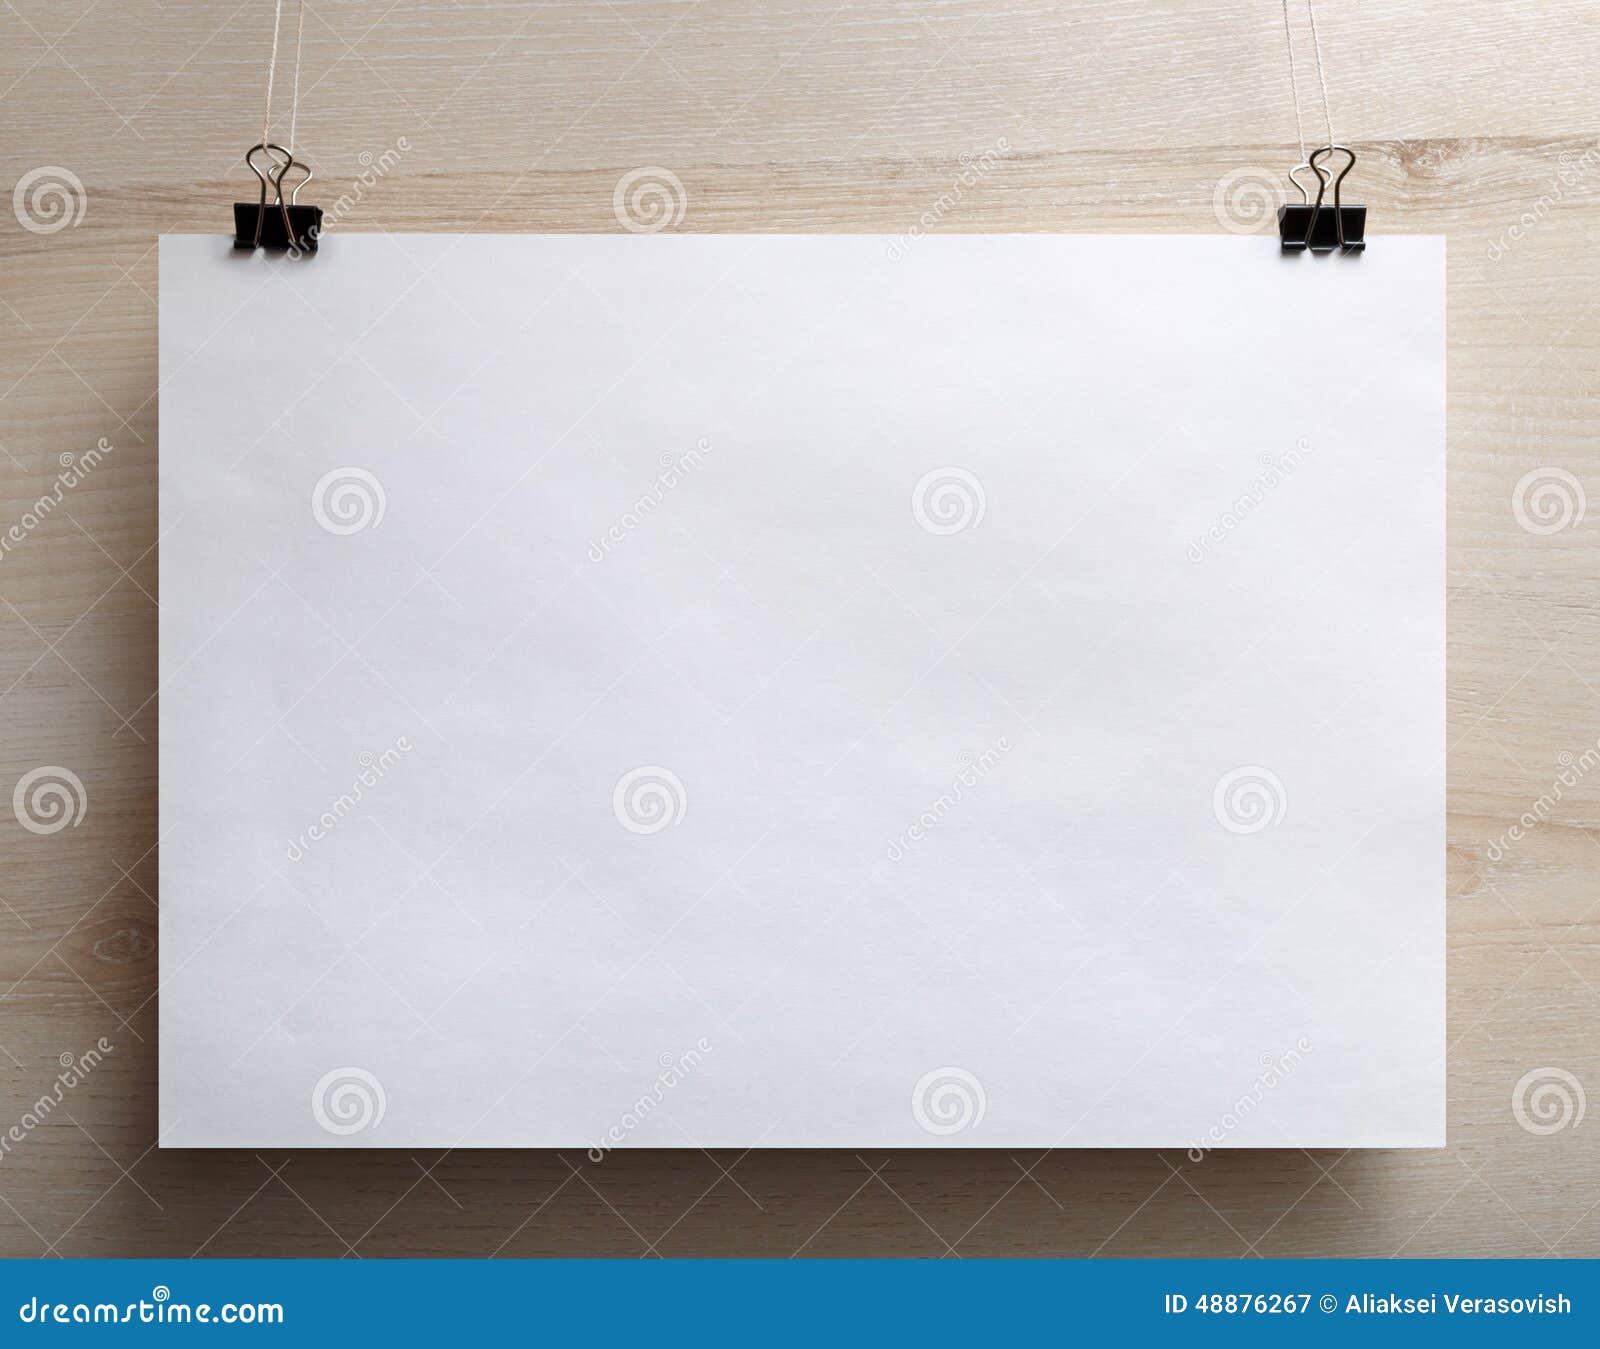 Horizontal Poster Stock Image. Image Of Nobody, Blank